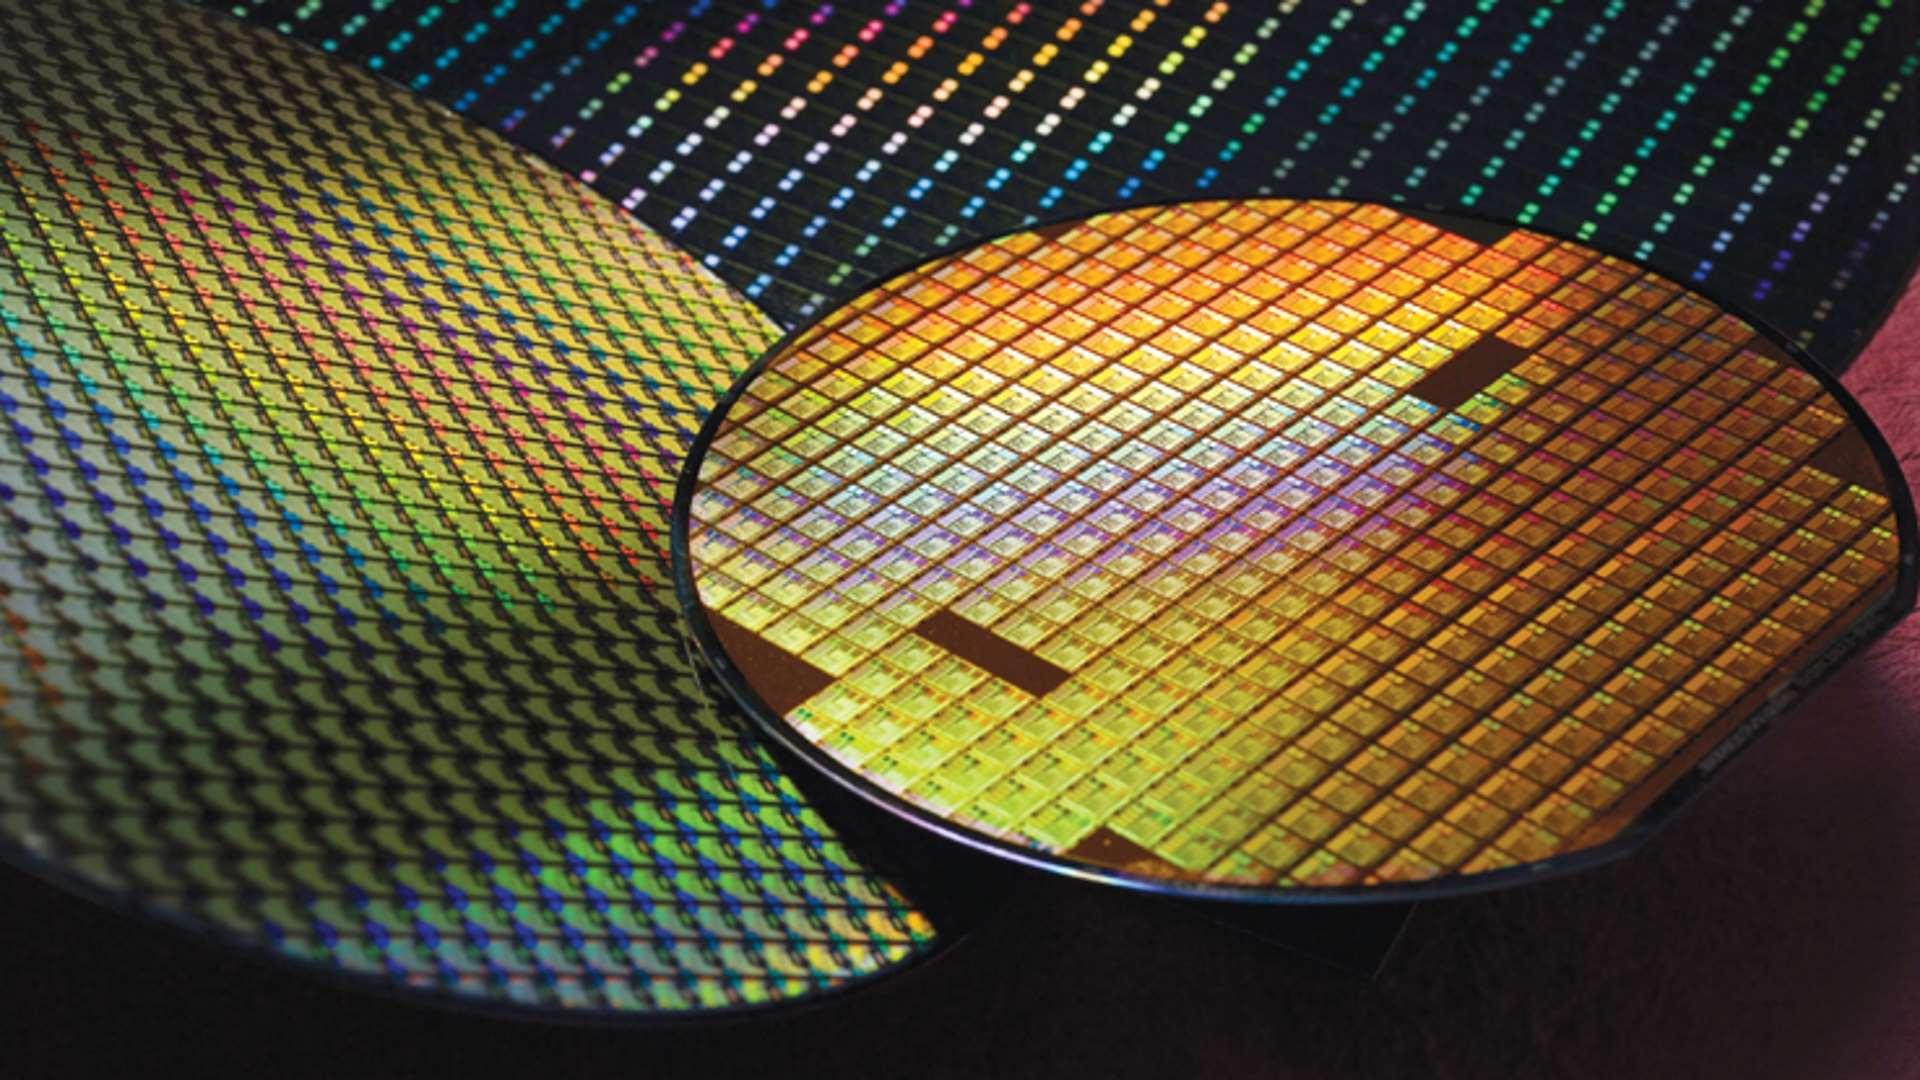 TSMC's 2020 5nm node has 80% higher transistor density than